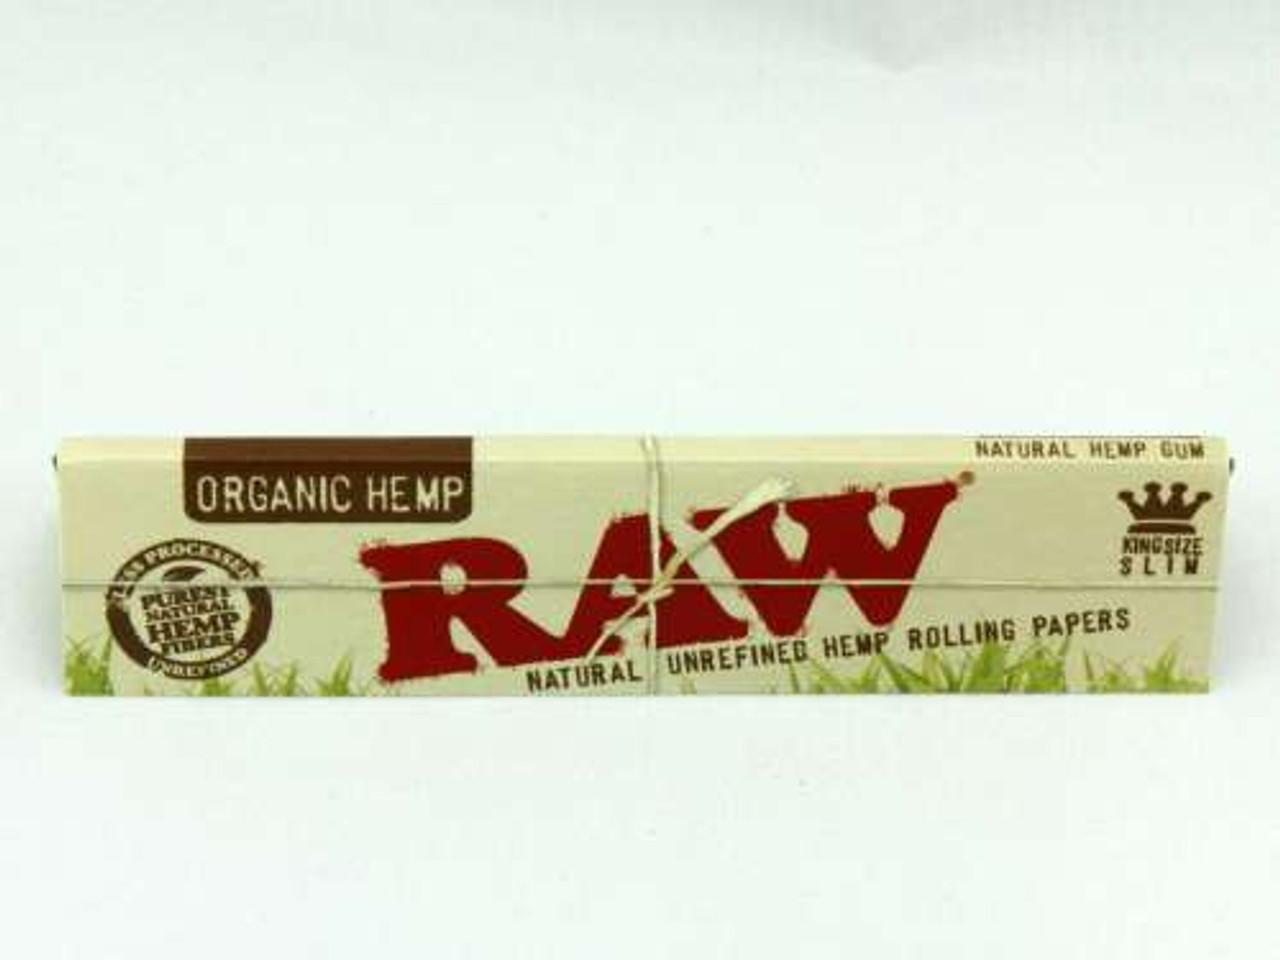 RAW Kingsize Slim Organic Hemp Rolling Papers